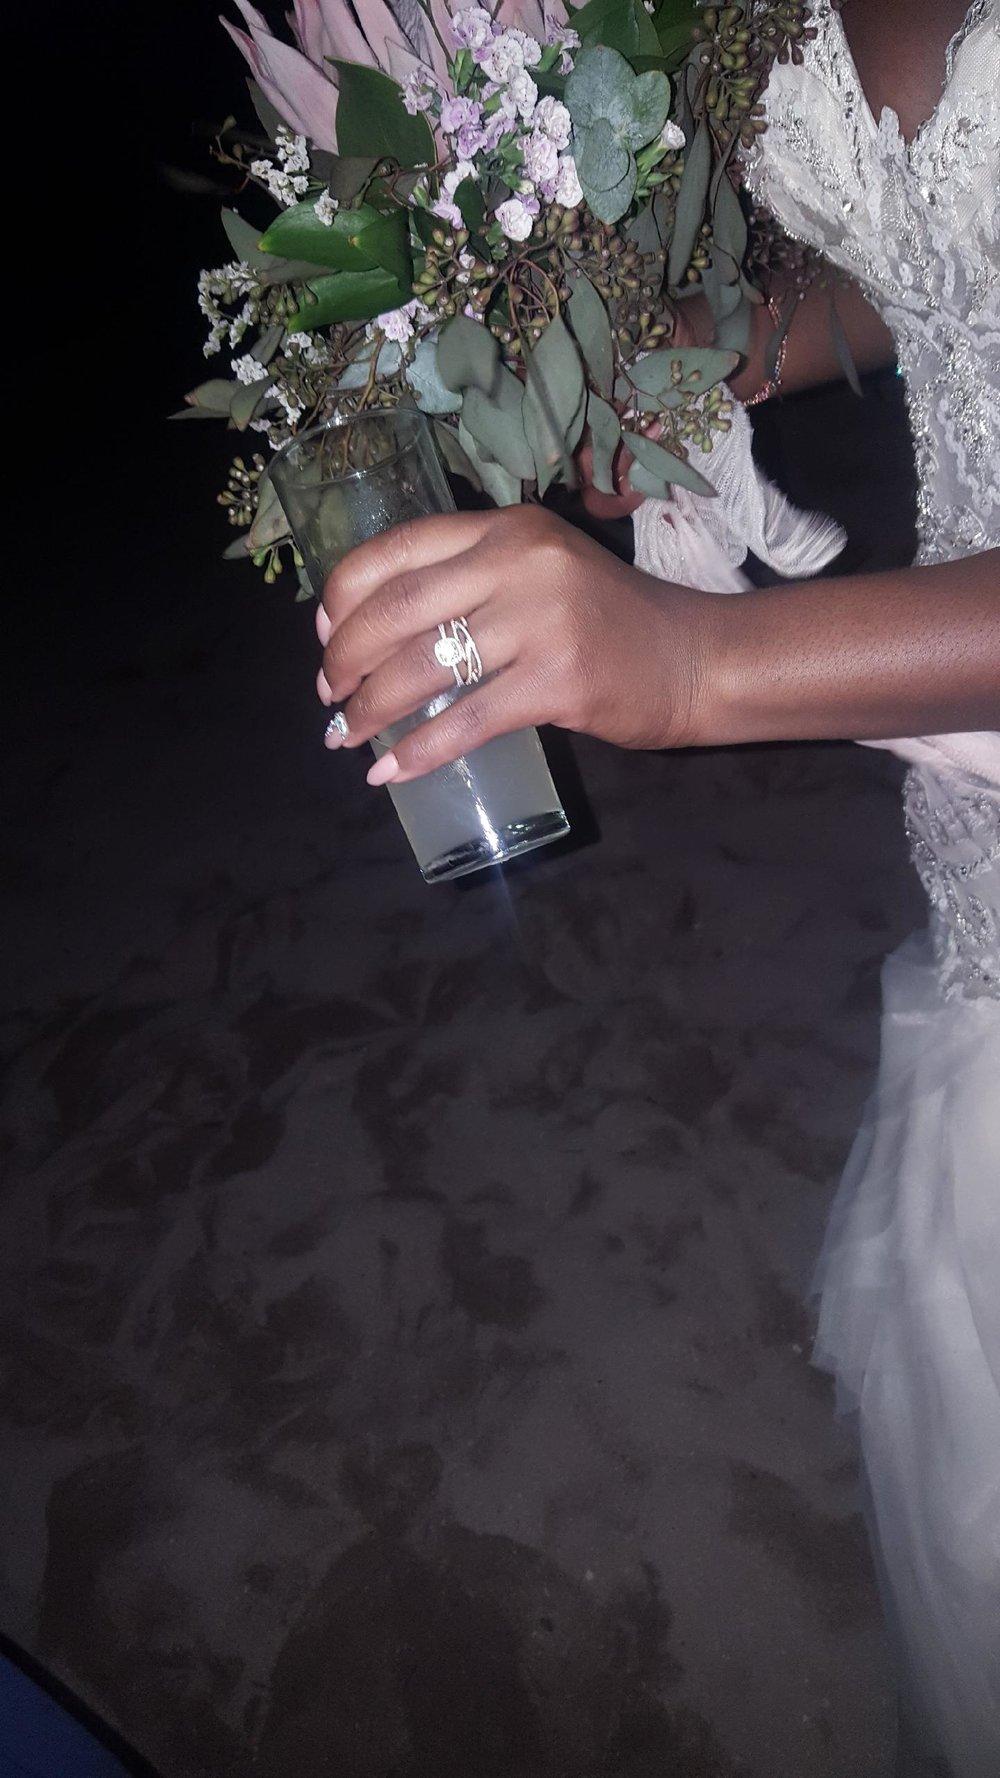 Black Destination Bride - Bridefriends Guide to Destination Weddings Podcast - BlackDesti Countdown - Blue Venado Beach Club - Shenko Photography - Mexico Wedding Photo Ivory Perkins Beauty - Simon G.jpg